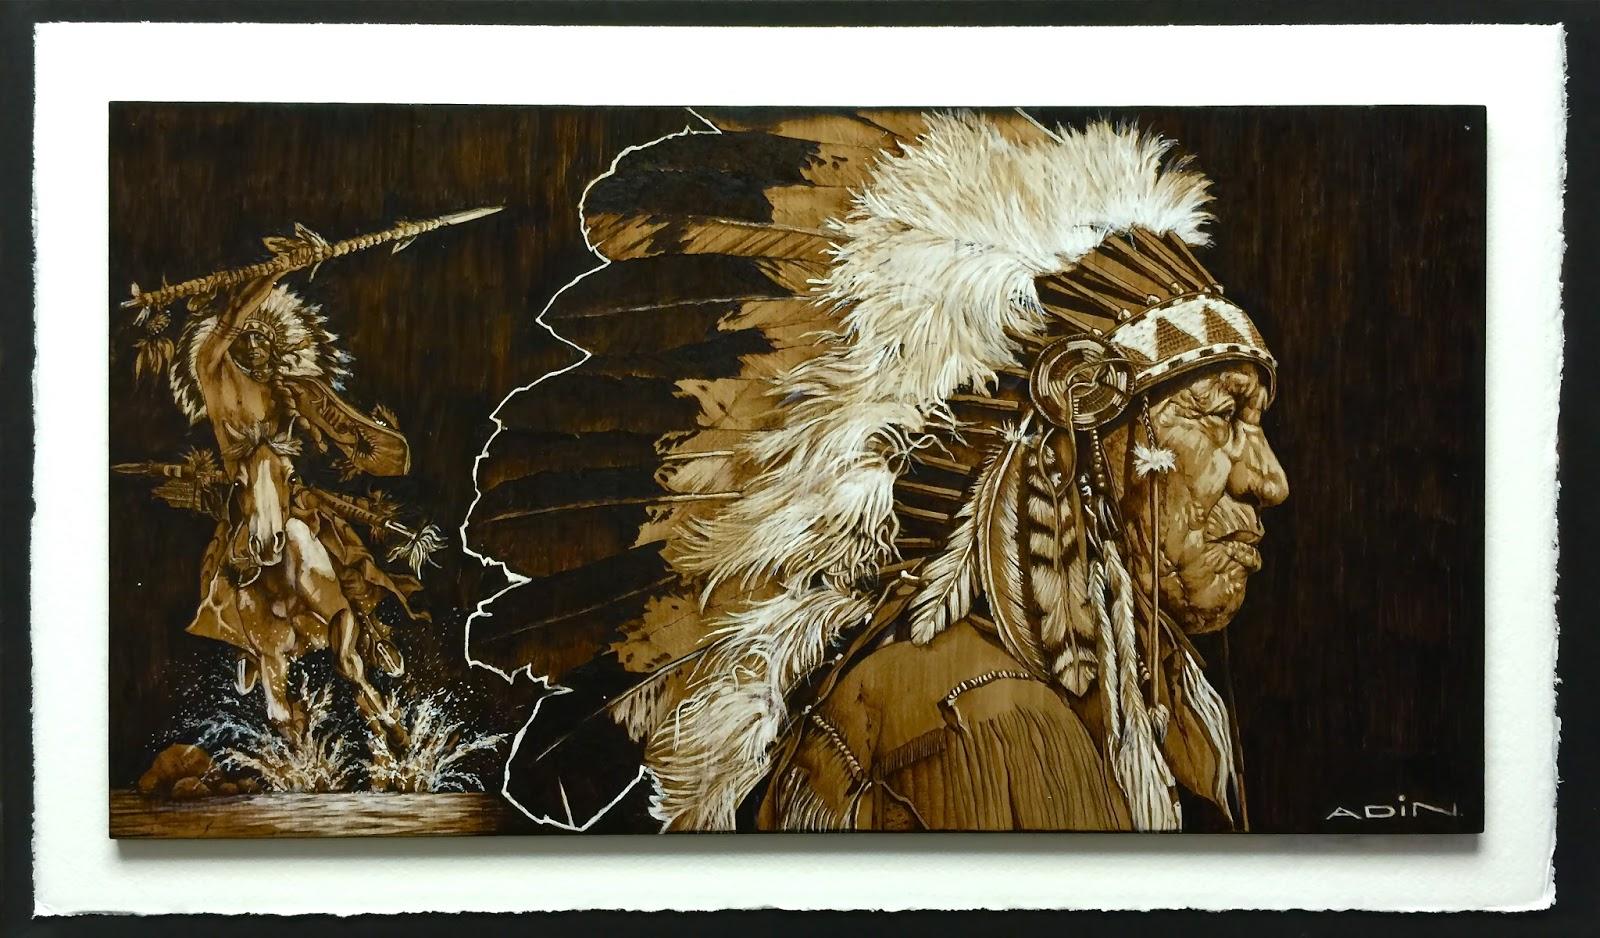 my pyrography  pyrography art by adin begic - wood-burning